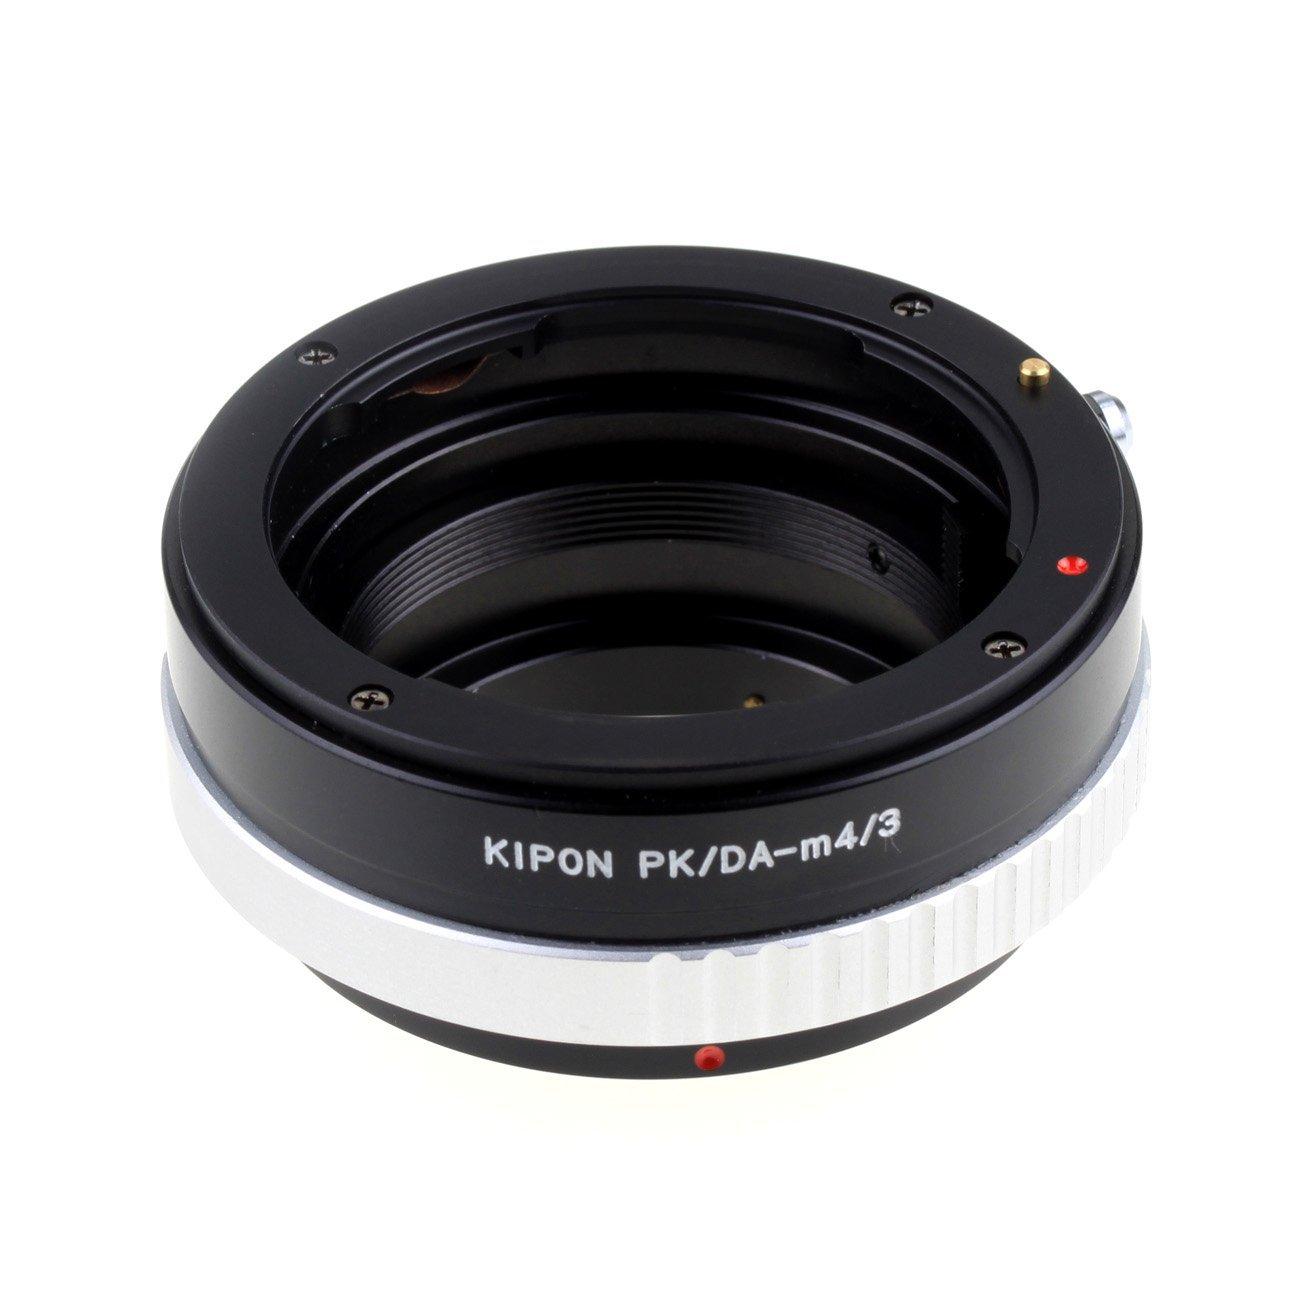 Kipon Pentax PK/DA Lens to Olympus/Panasonic Micro Four